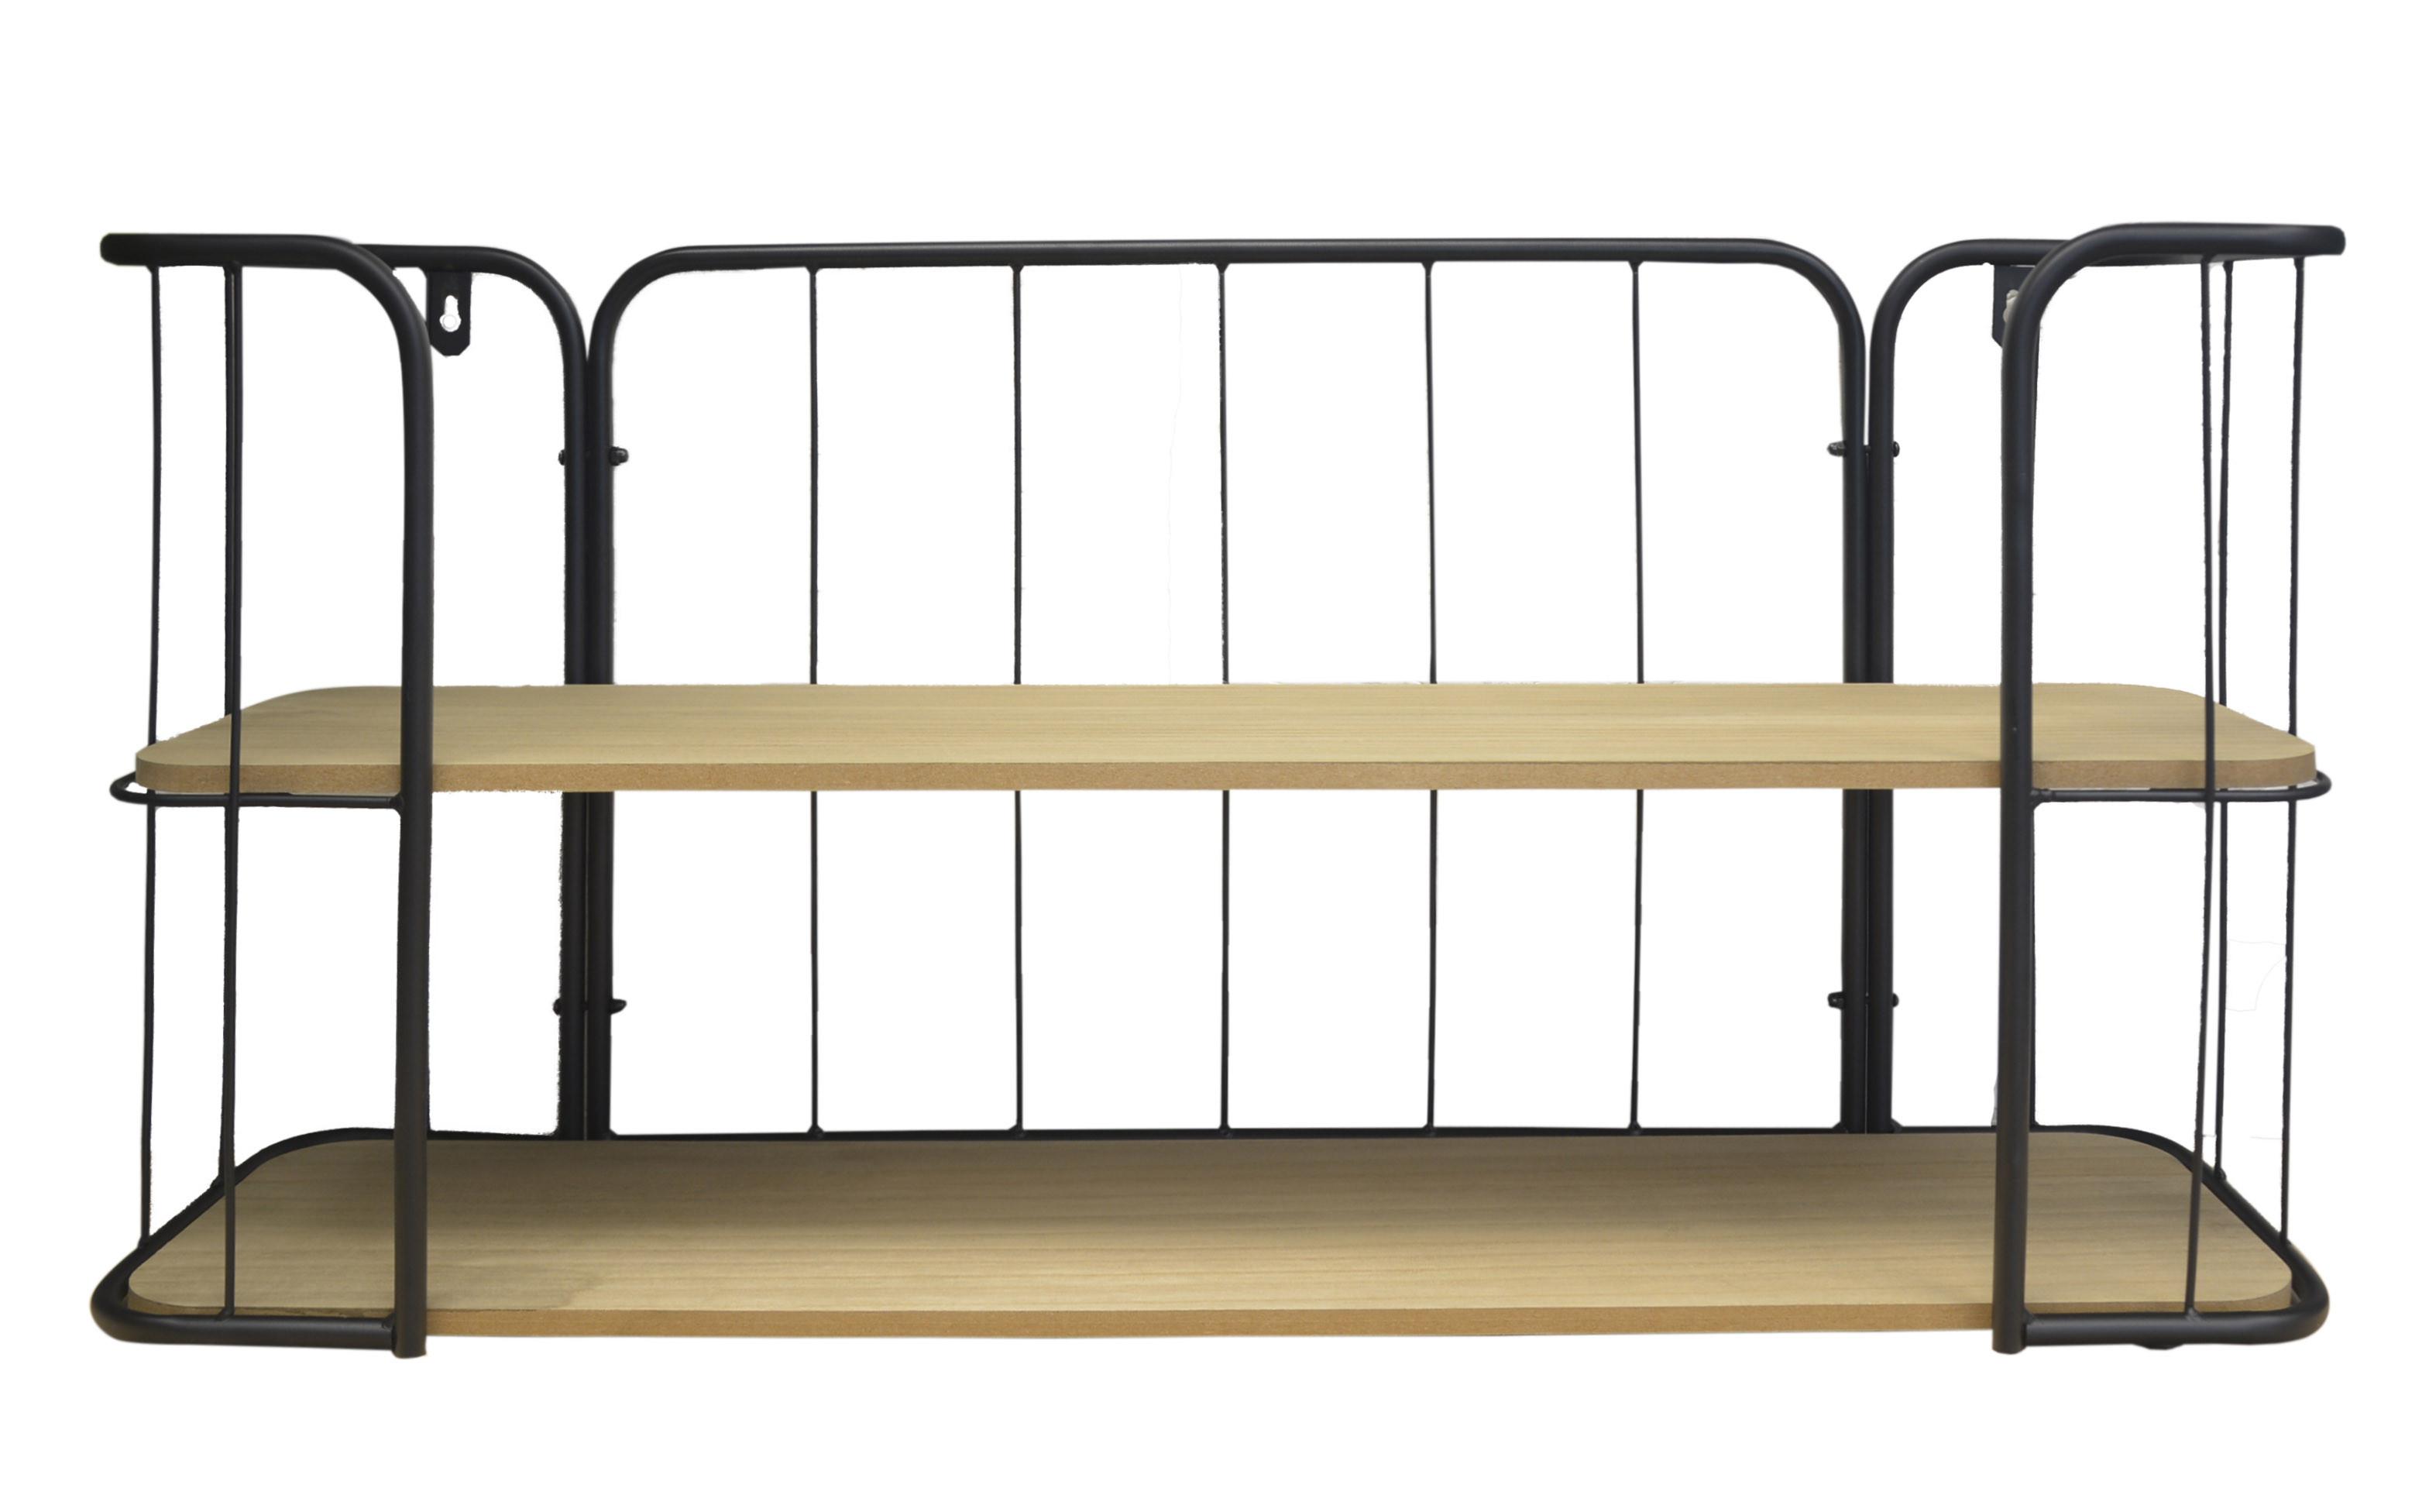 Shelf Wall Wood and Metal 2 Shelves, Floating Shelves Modern Bedroom/living Room 75x36x20 cm